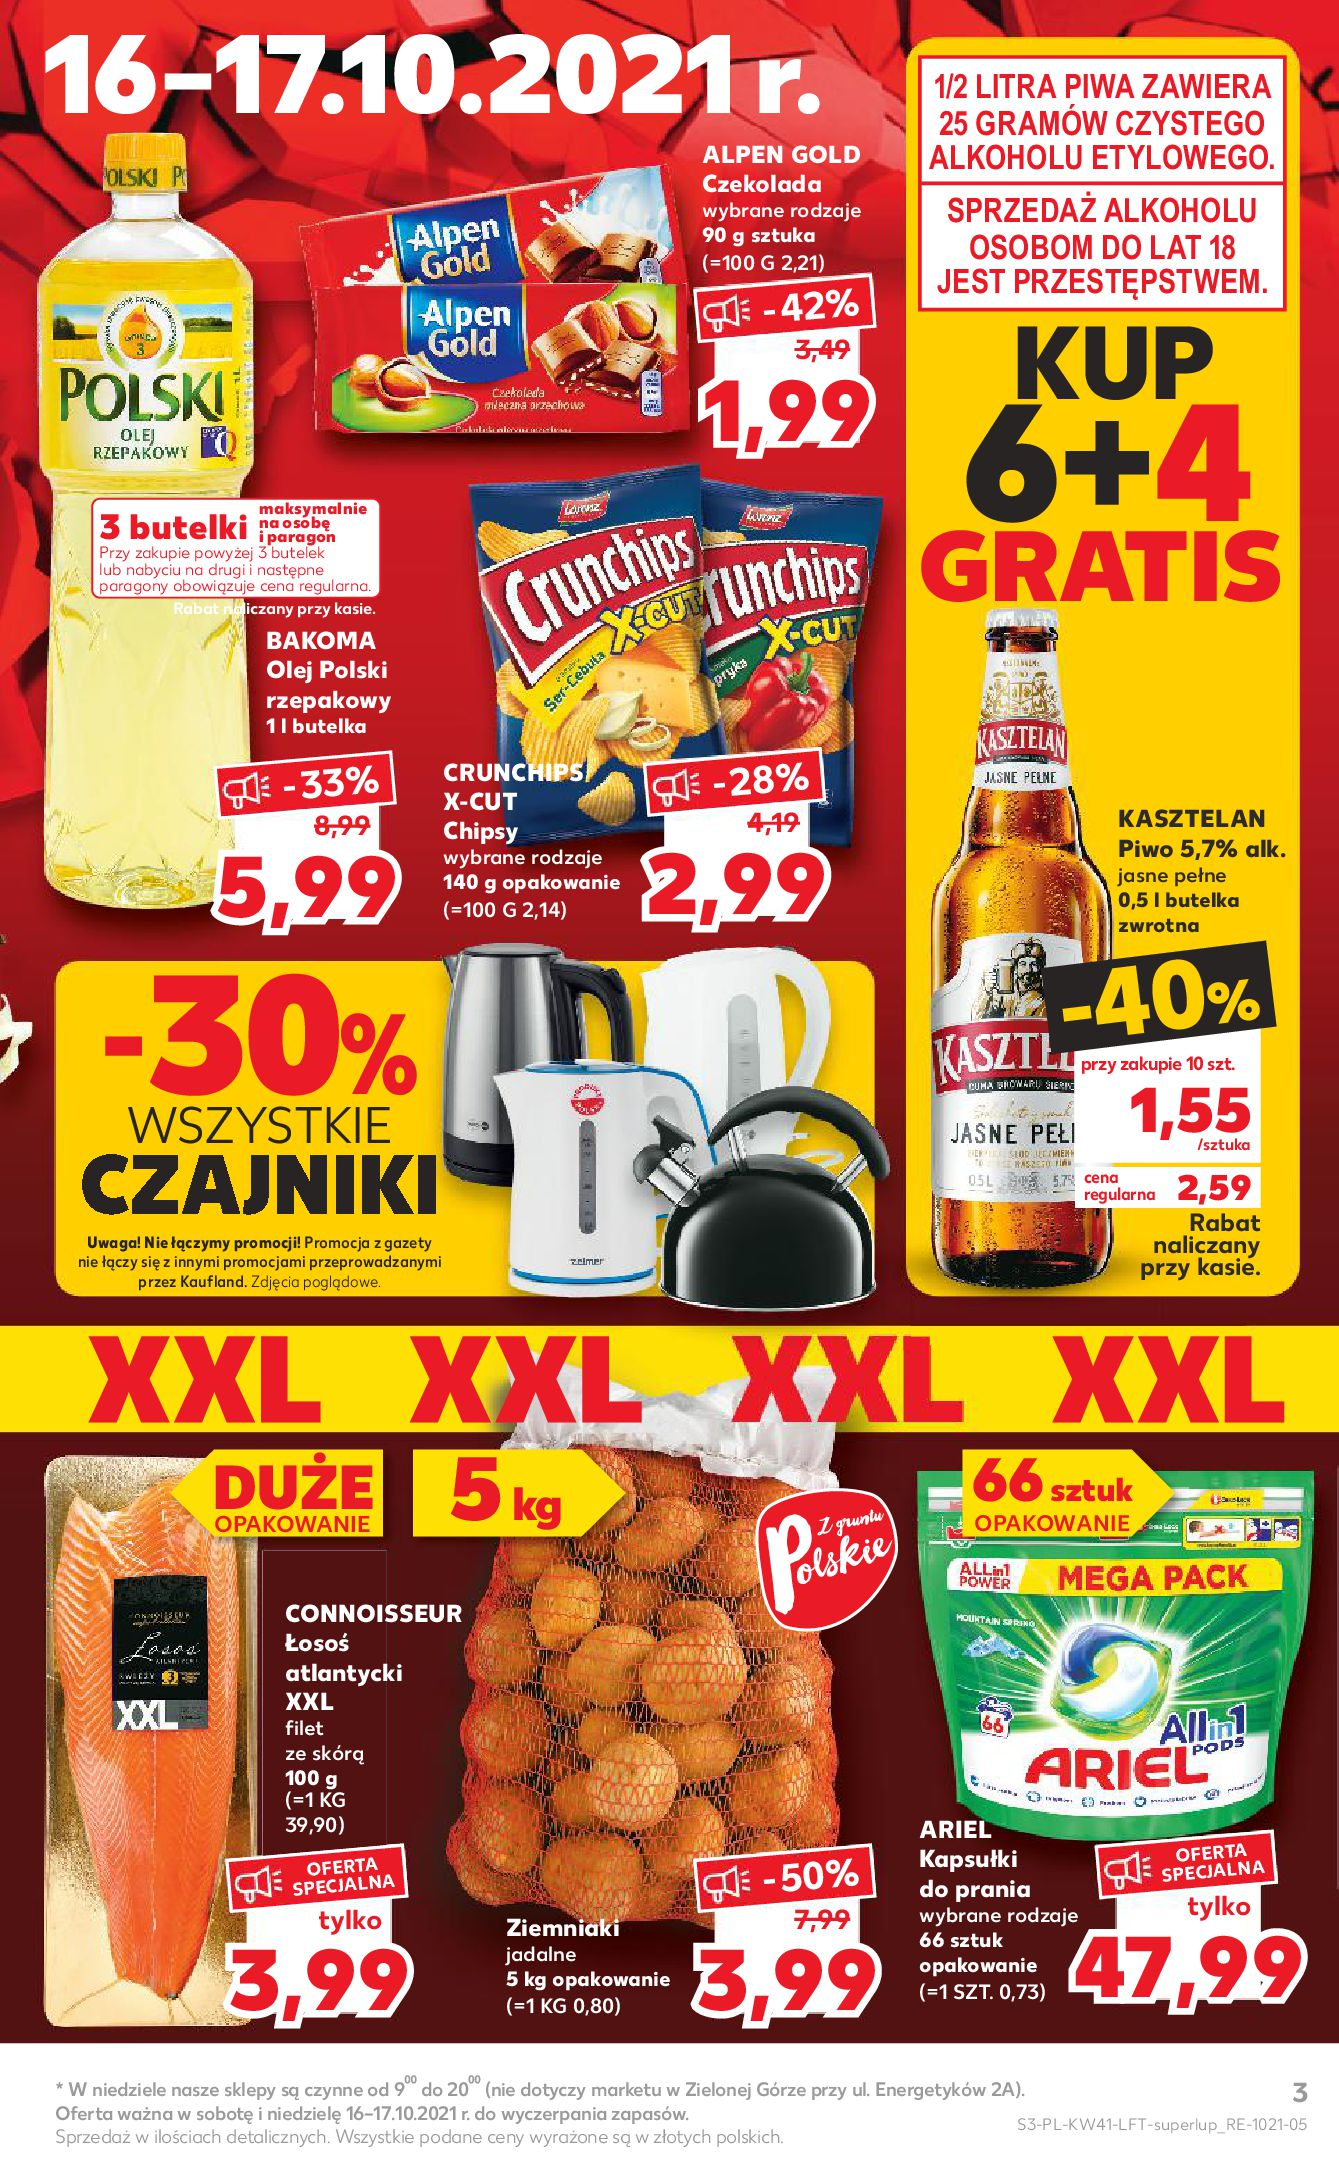 Gazetka Kaufland: Gazetka Kaufland 14-20.10. 2021-10-14 page-3